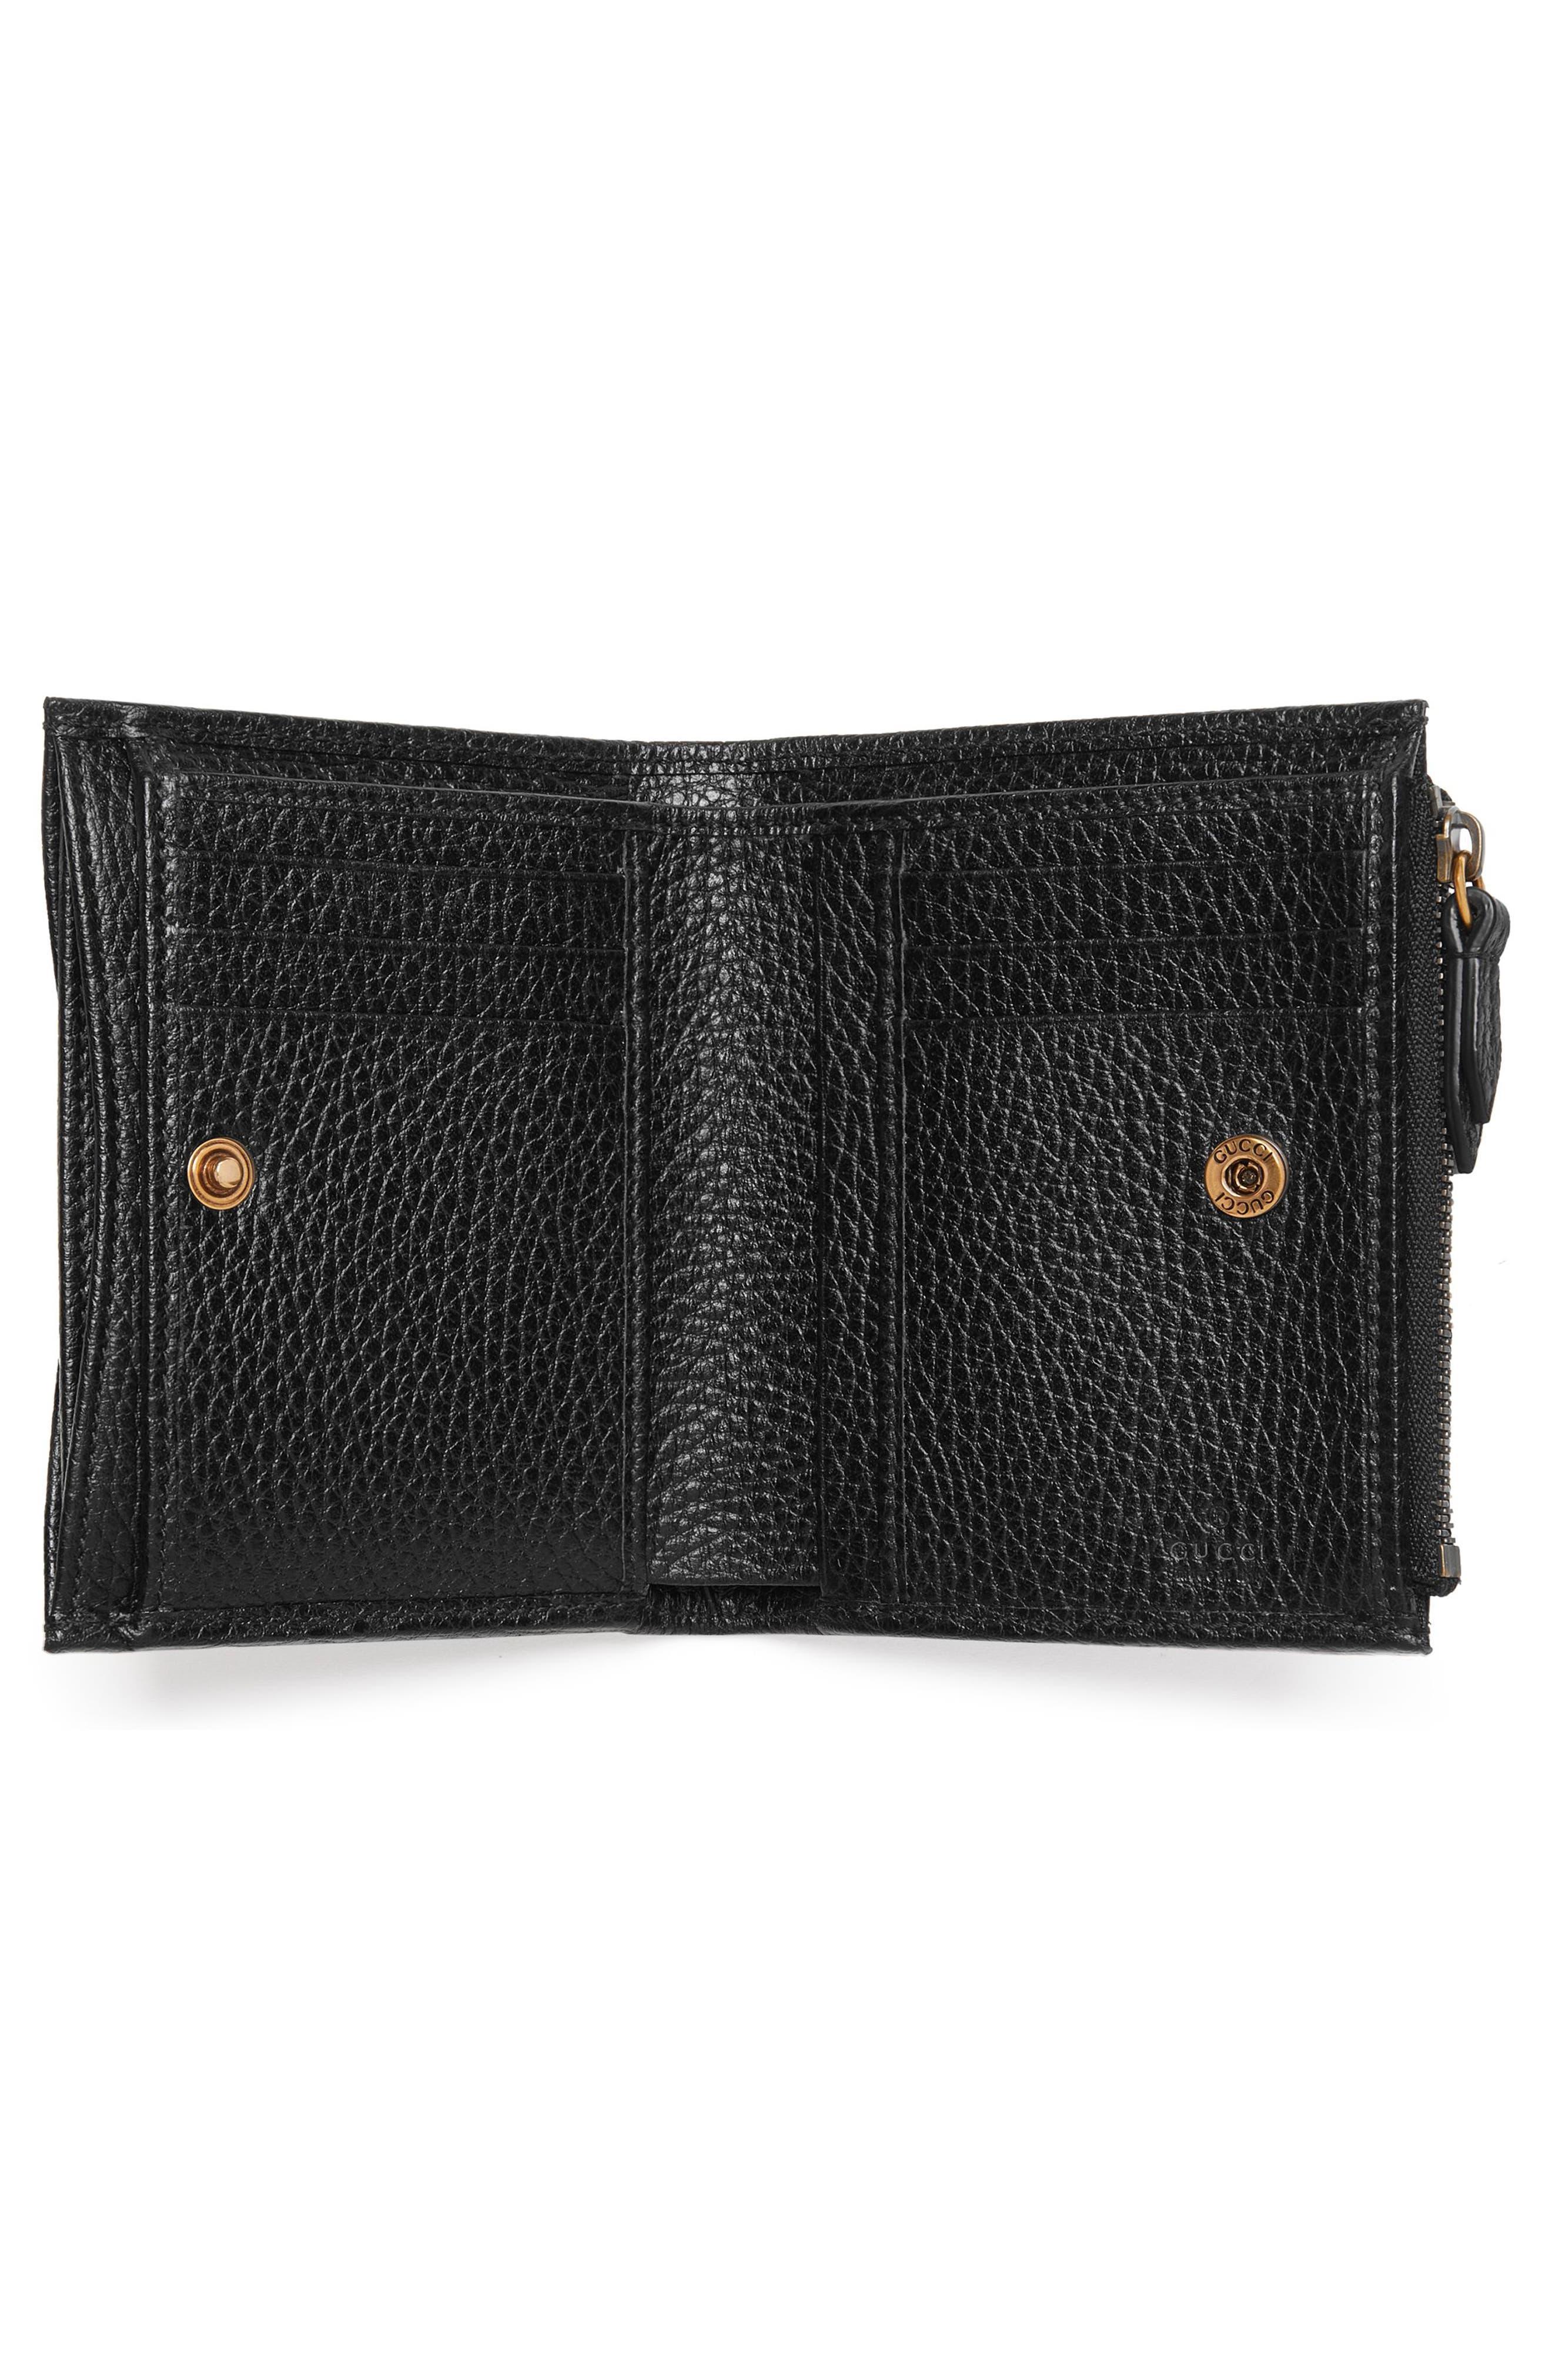 Farfalla Leather Wallet,                             Alternate thumbnail 2, color,                             NERO/ CRYSTAL